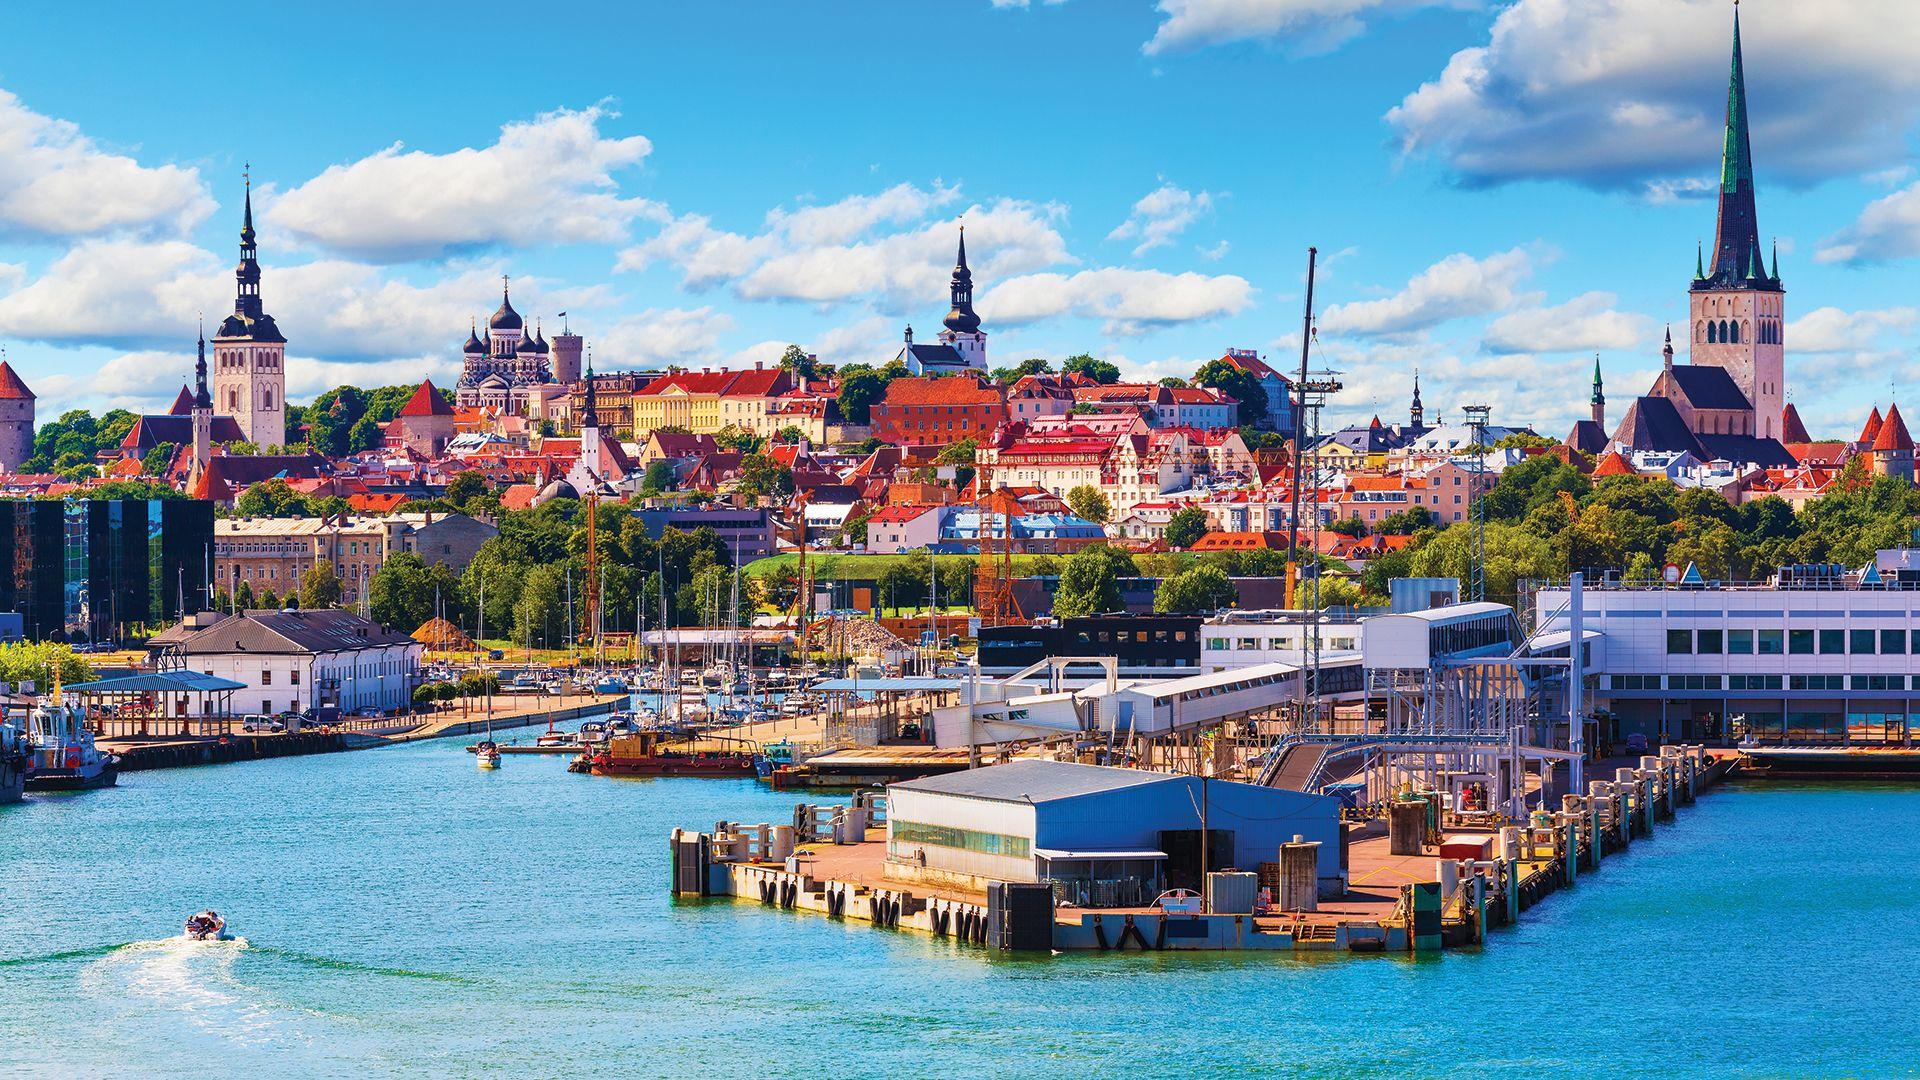 Lituanie, Lettonie et Estonie